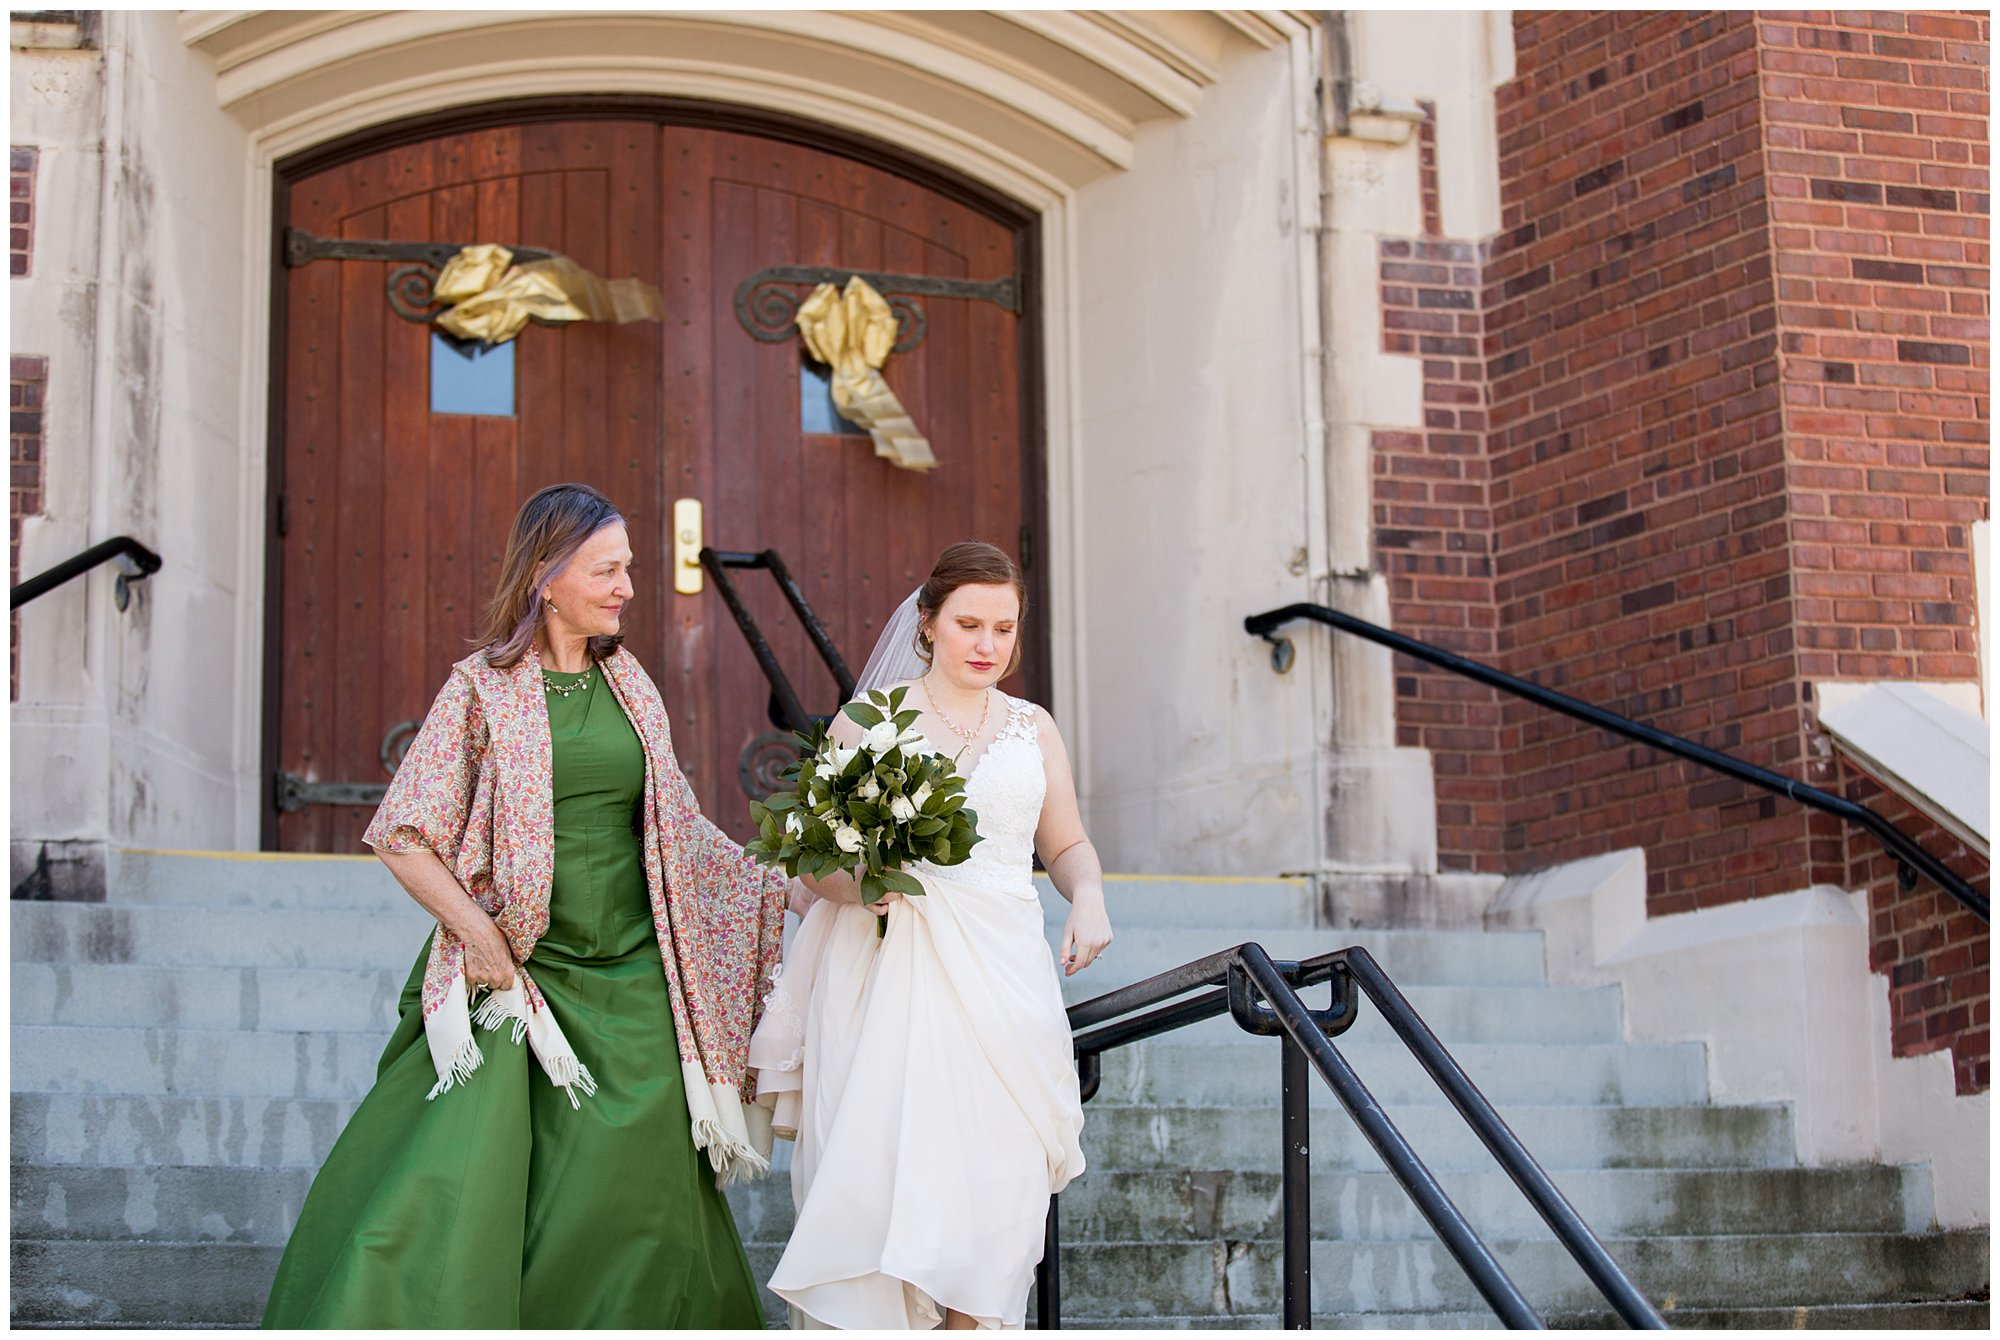 bride's mother walks bride toward groom for first look before wedding ceremony